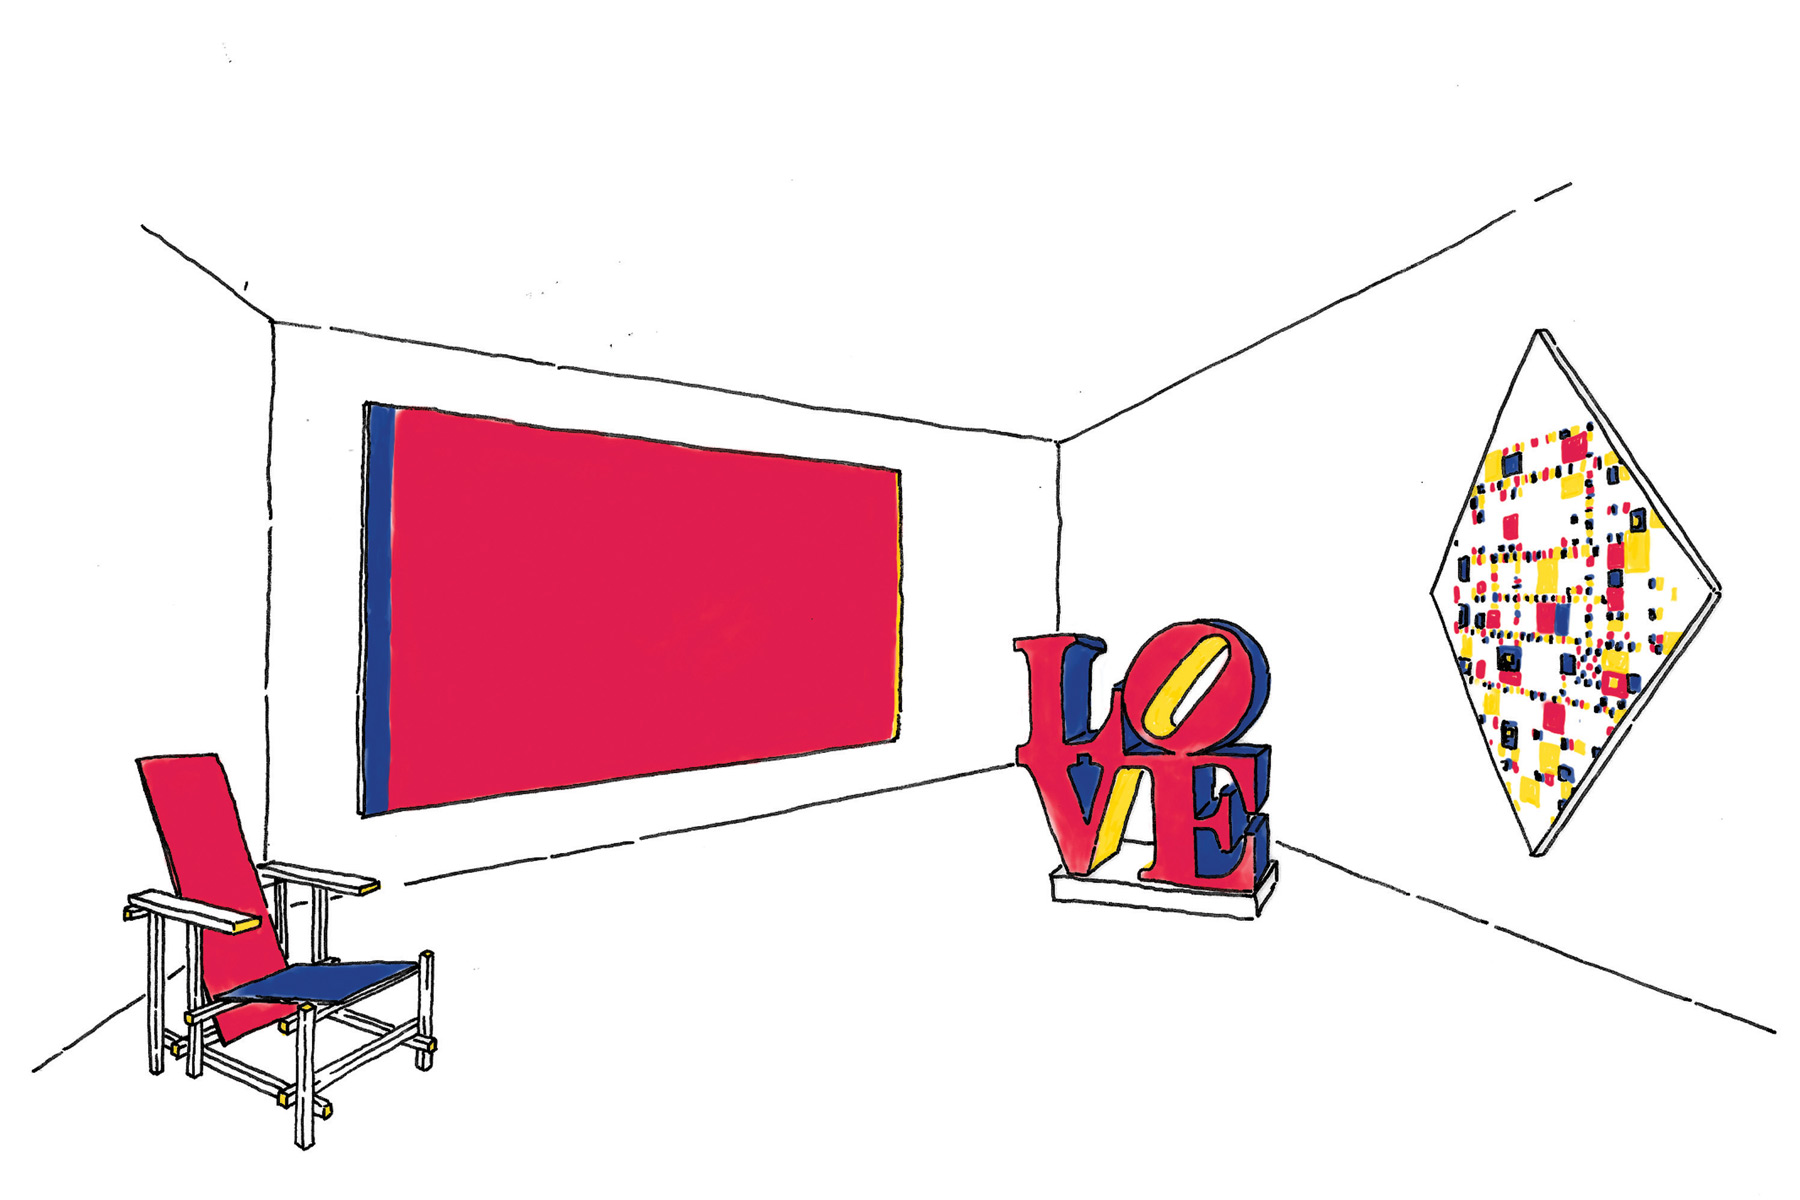 redbull-creativestudio-01